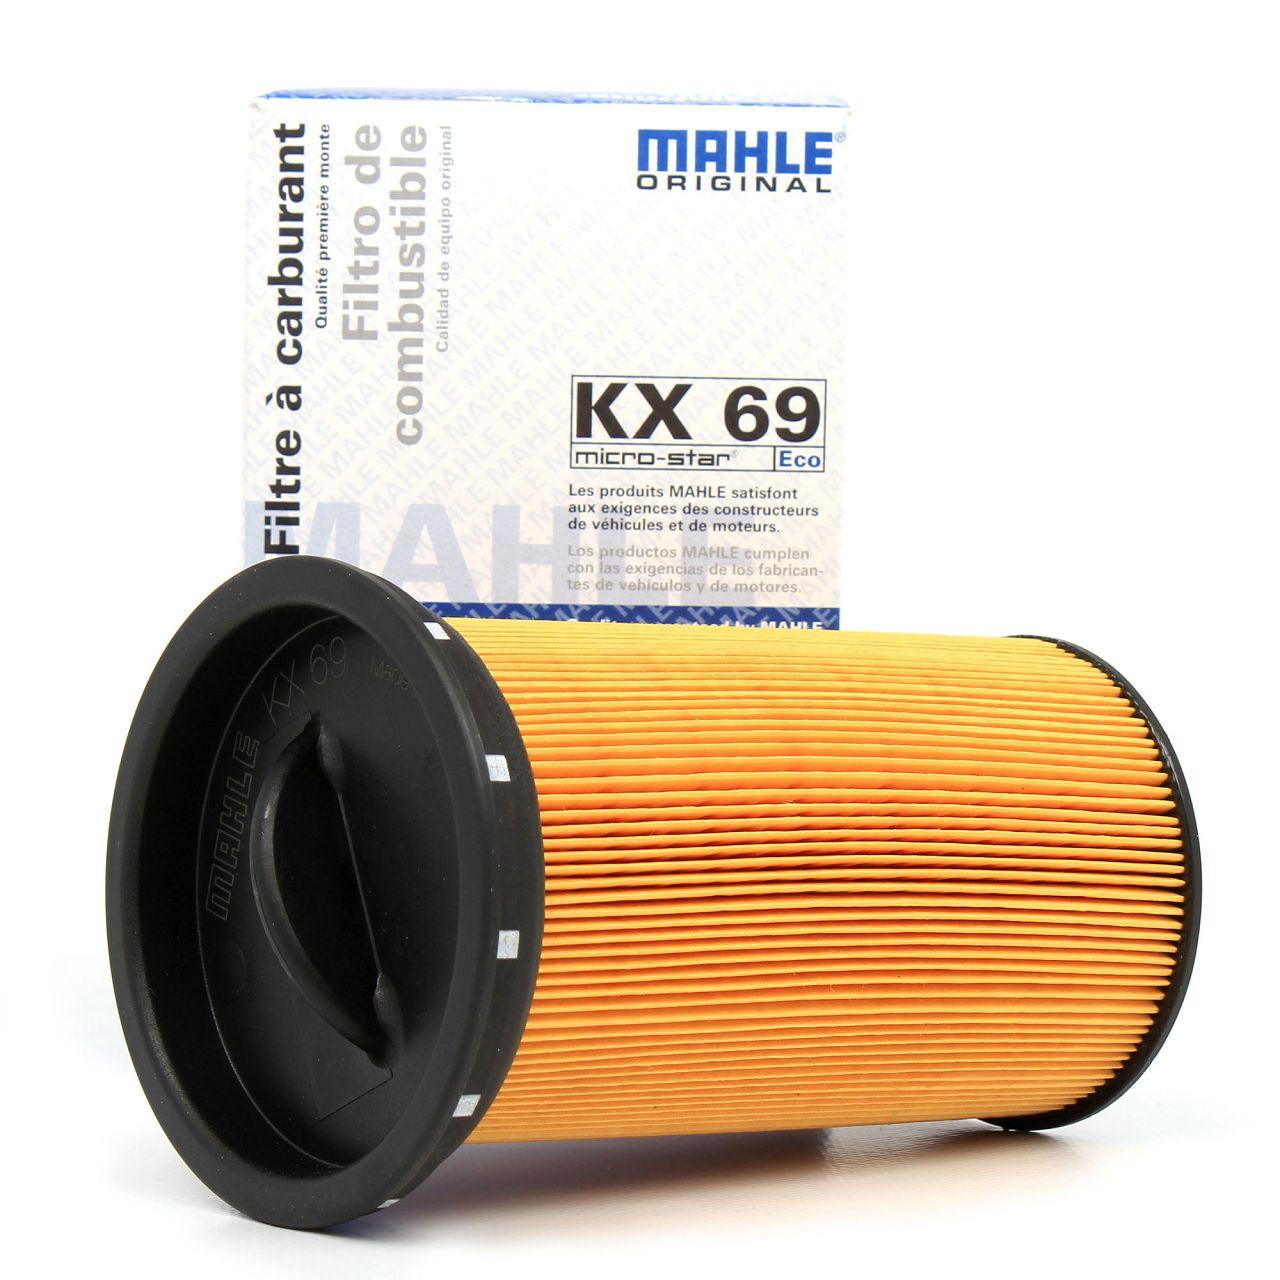 KNECHT / MAHLE Kraftstofffilter Dieselfilter KX69 für BMW 3er E46 318d 320d